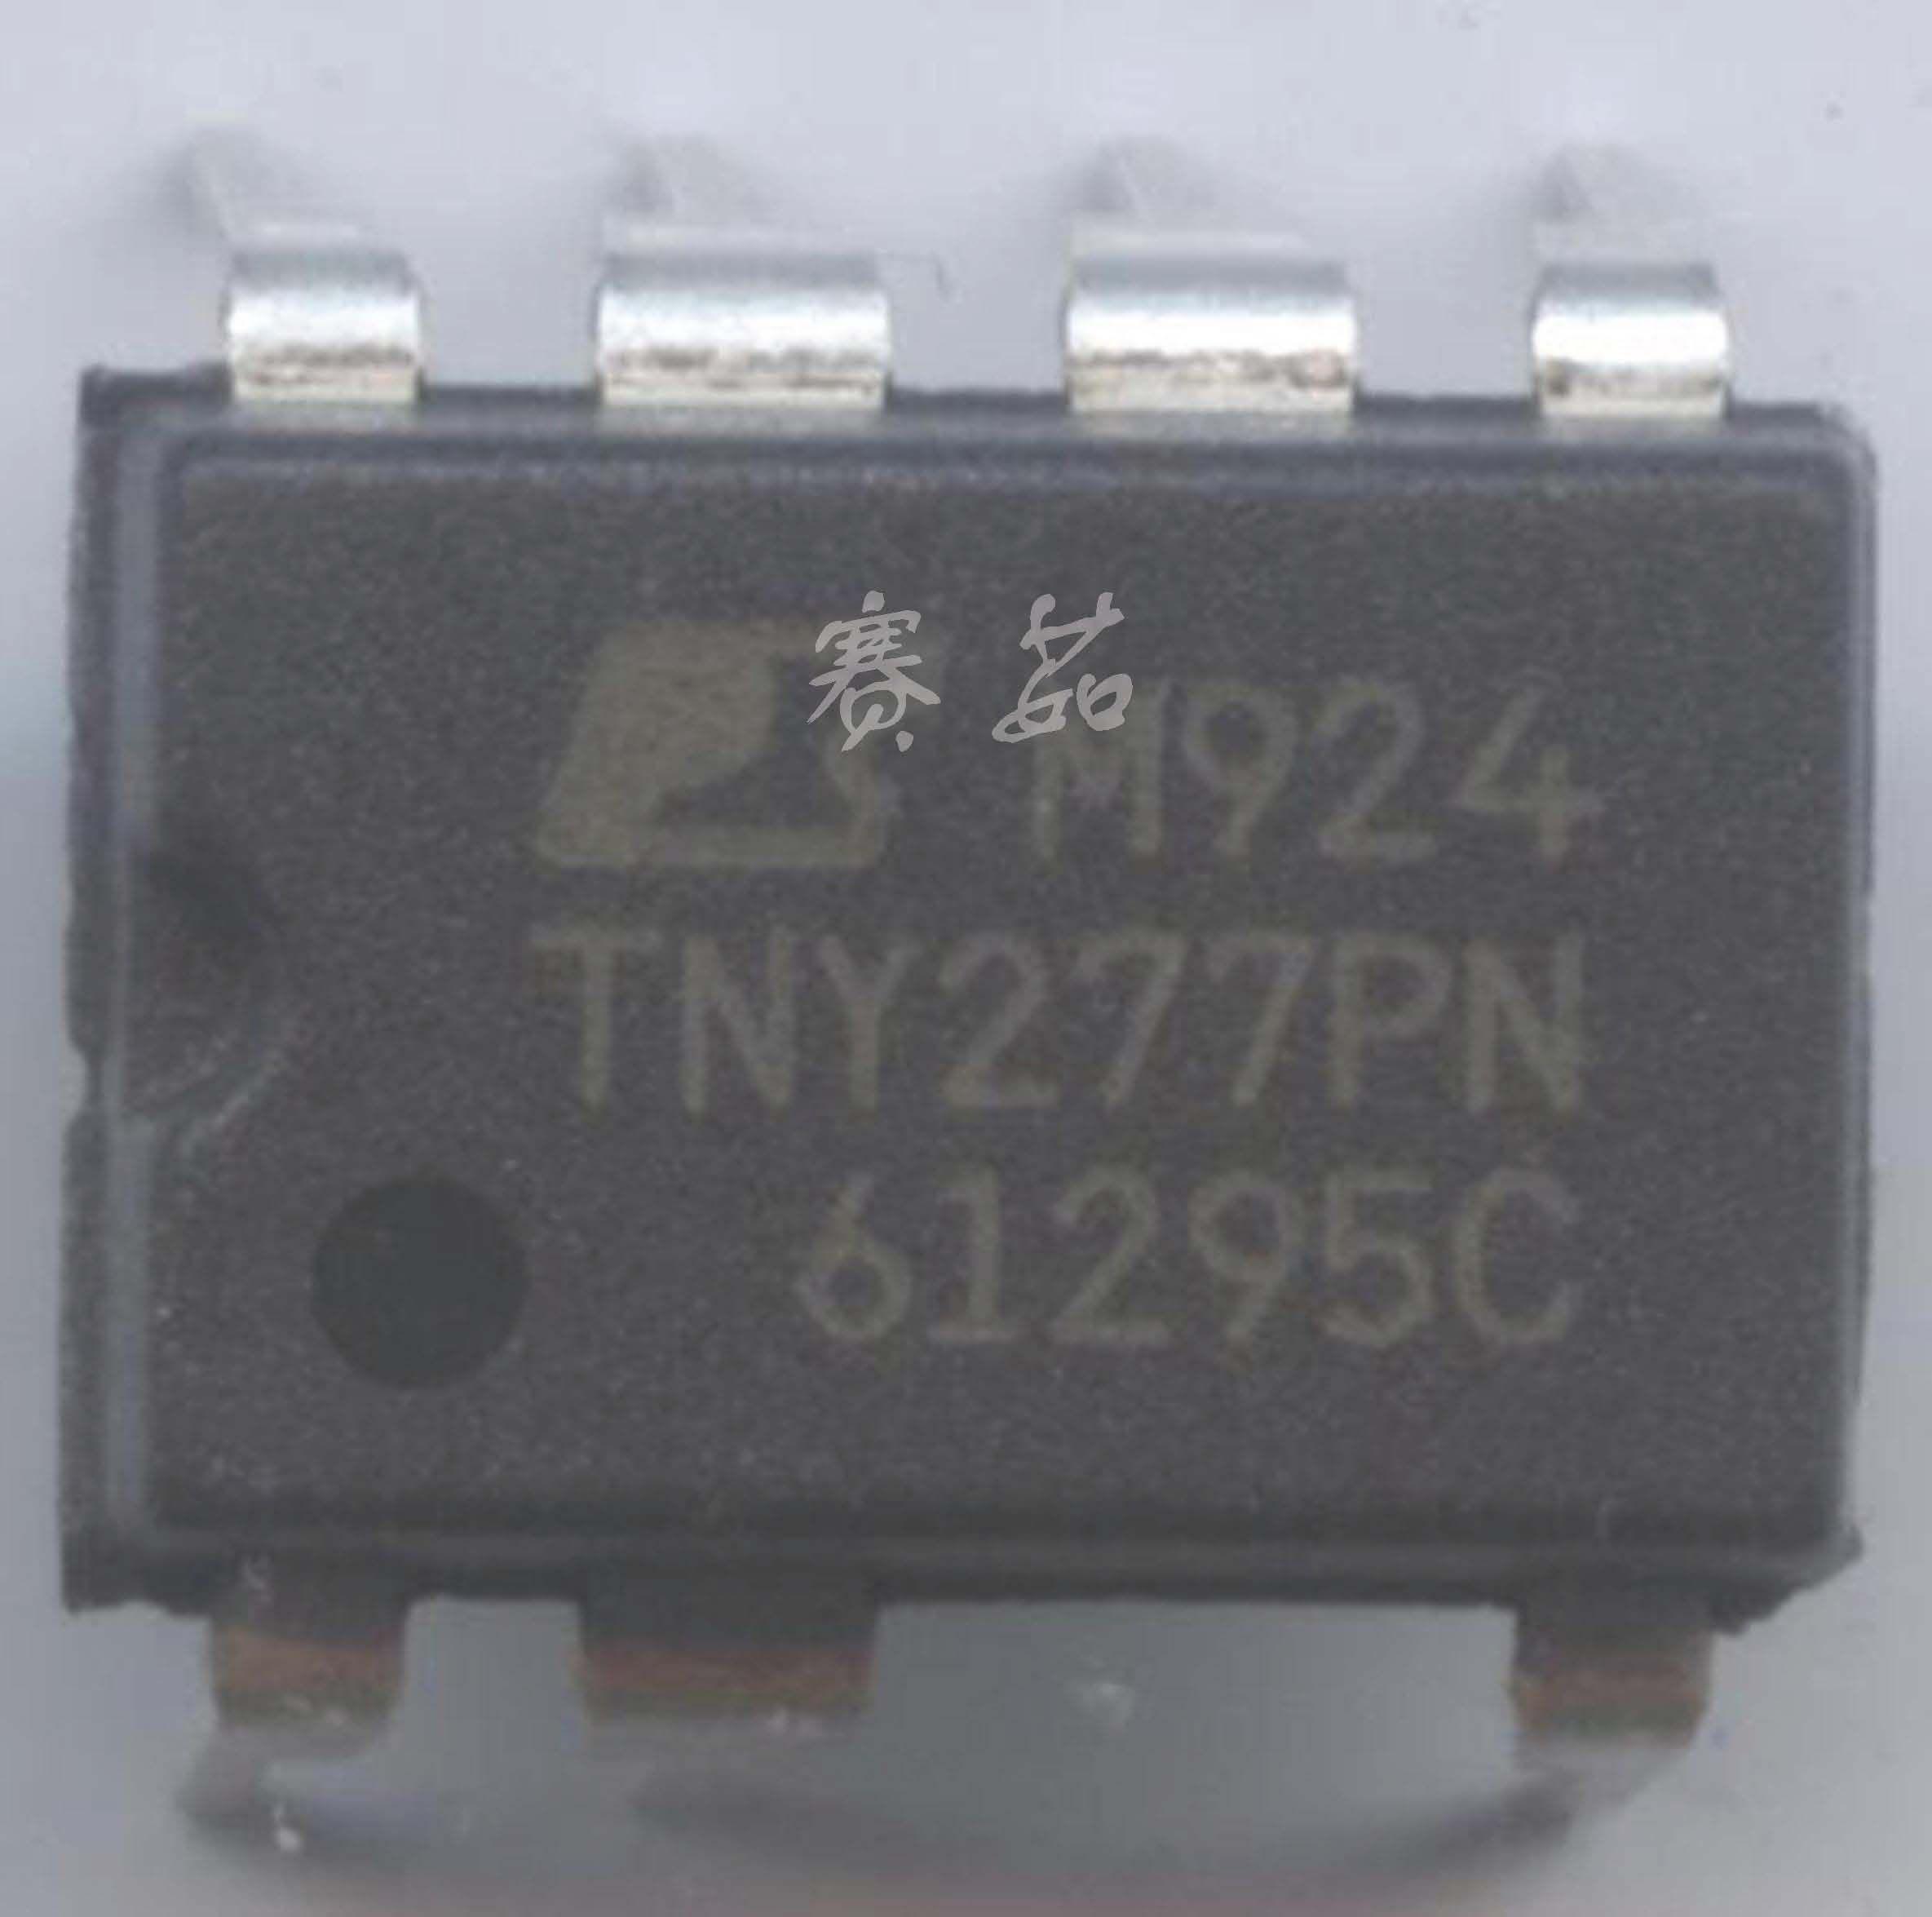 2018 Tny277pn Off Line Switch Power Ic From Janongpao 146